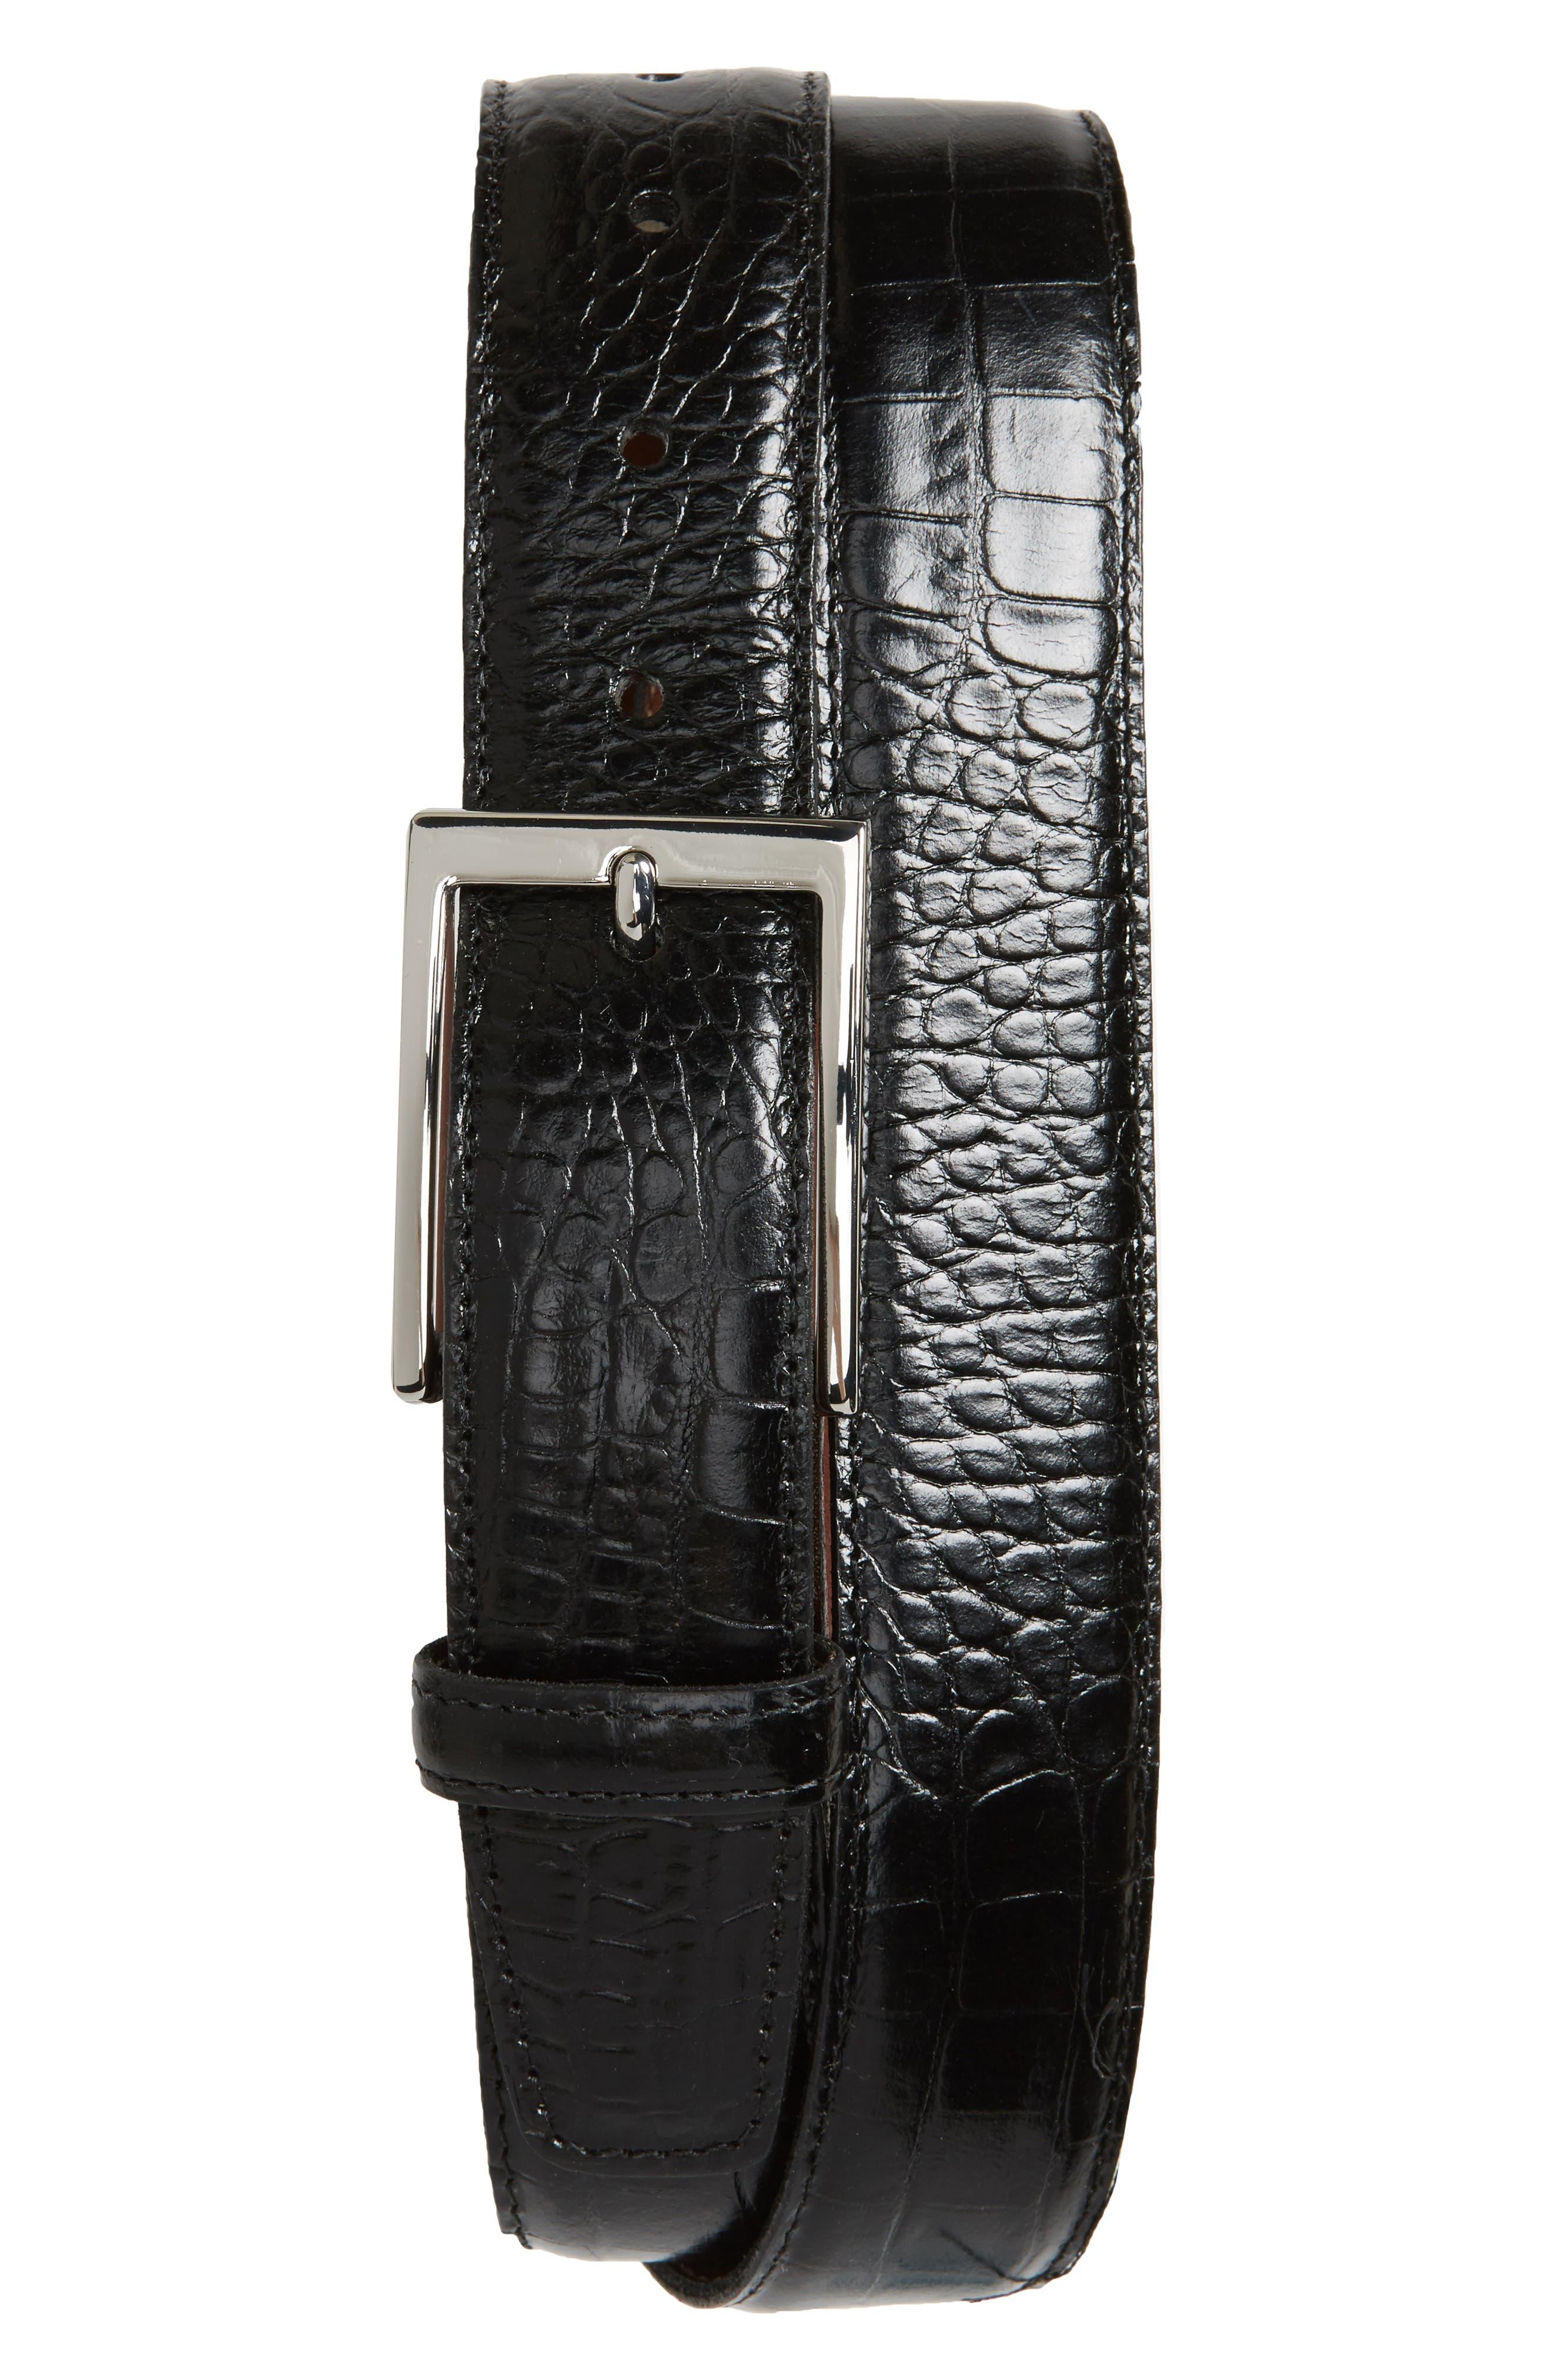 Torino Belts Gator Grain Embossed Leather Belt